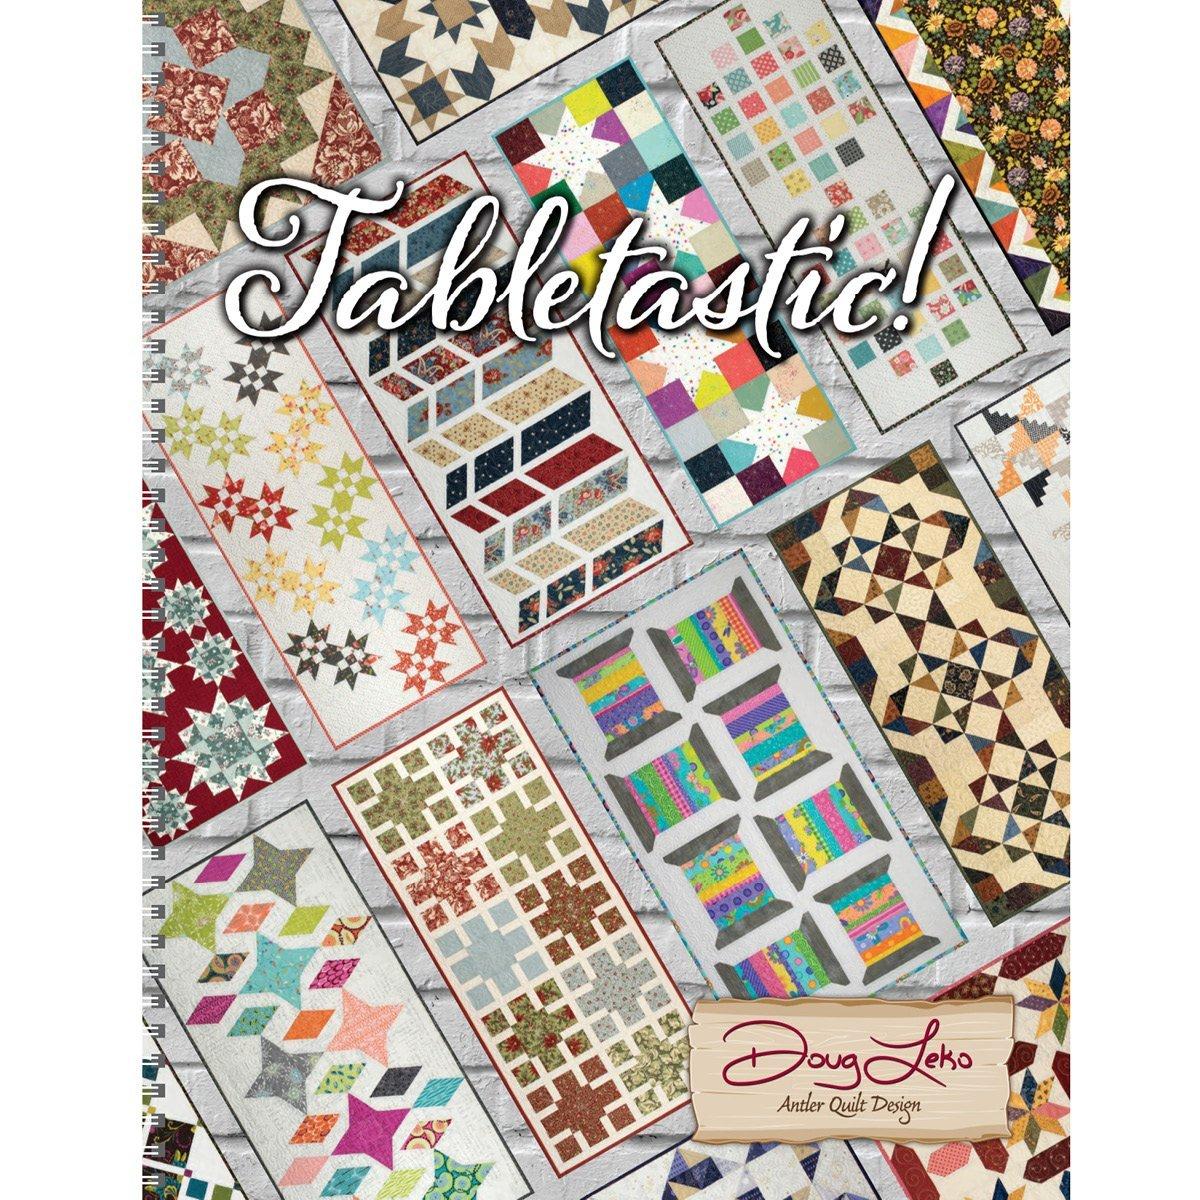 Tabletastic! Book by Antler Quilt Design AQD415